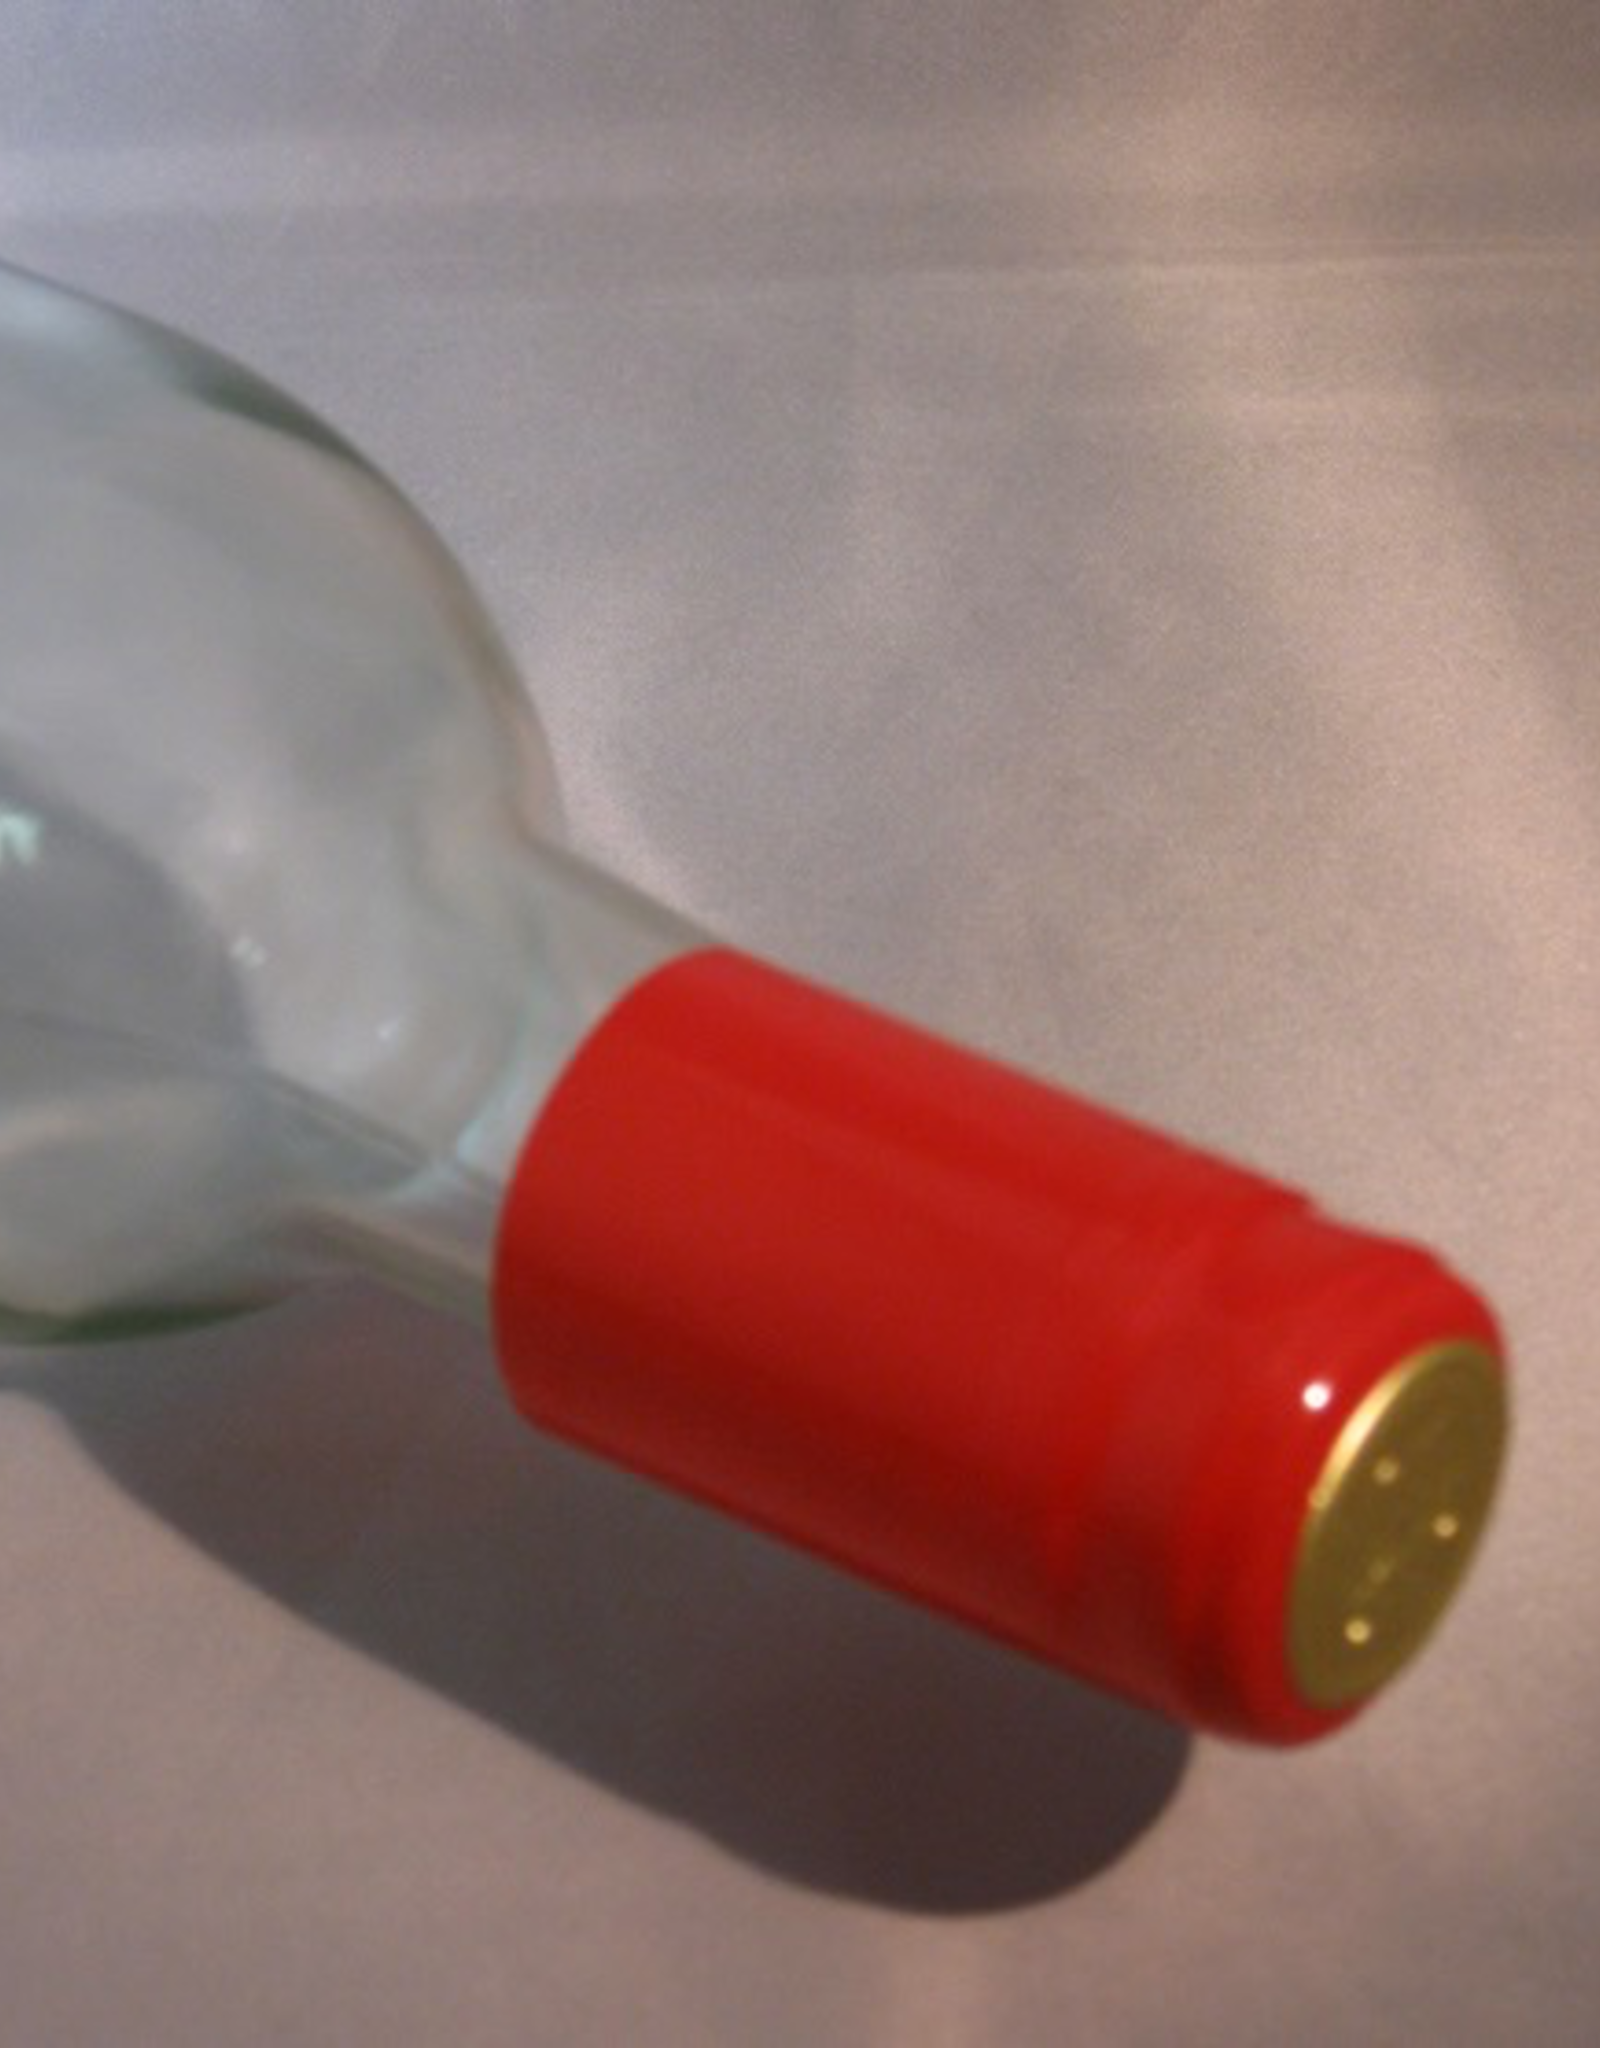 LD CARLSON RED PVC SHRINK CAPSULES 30/BAG